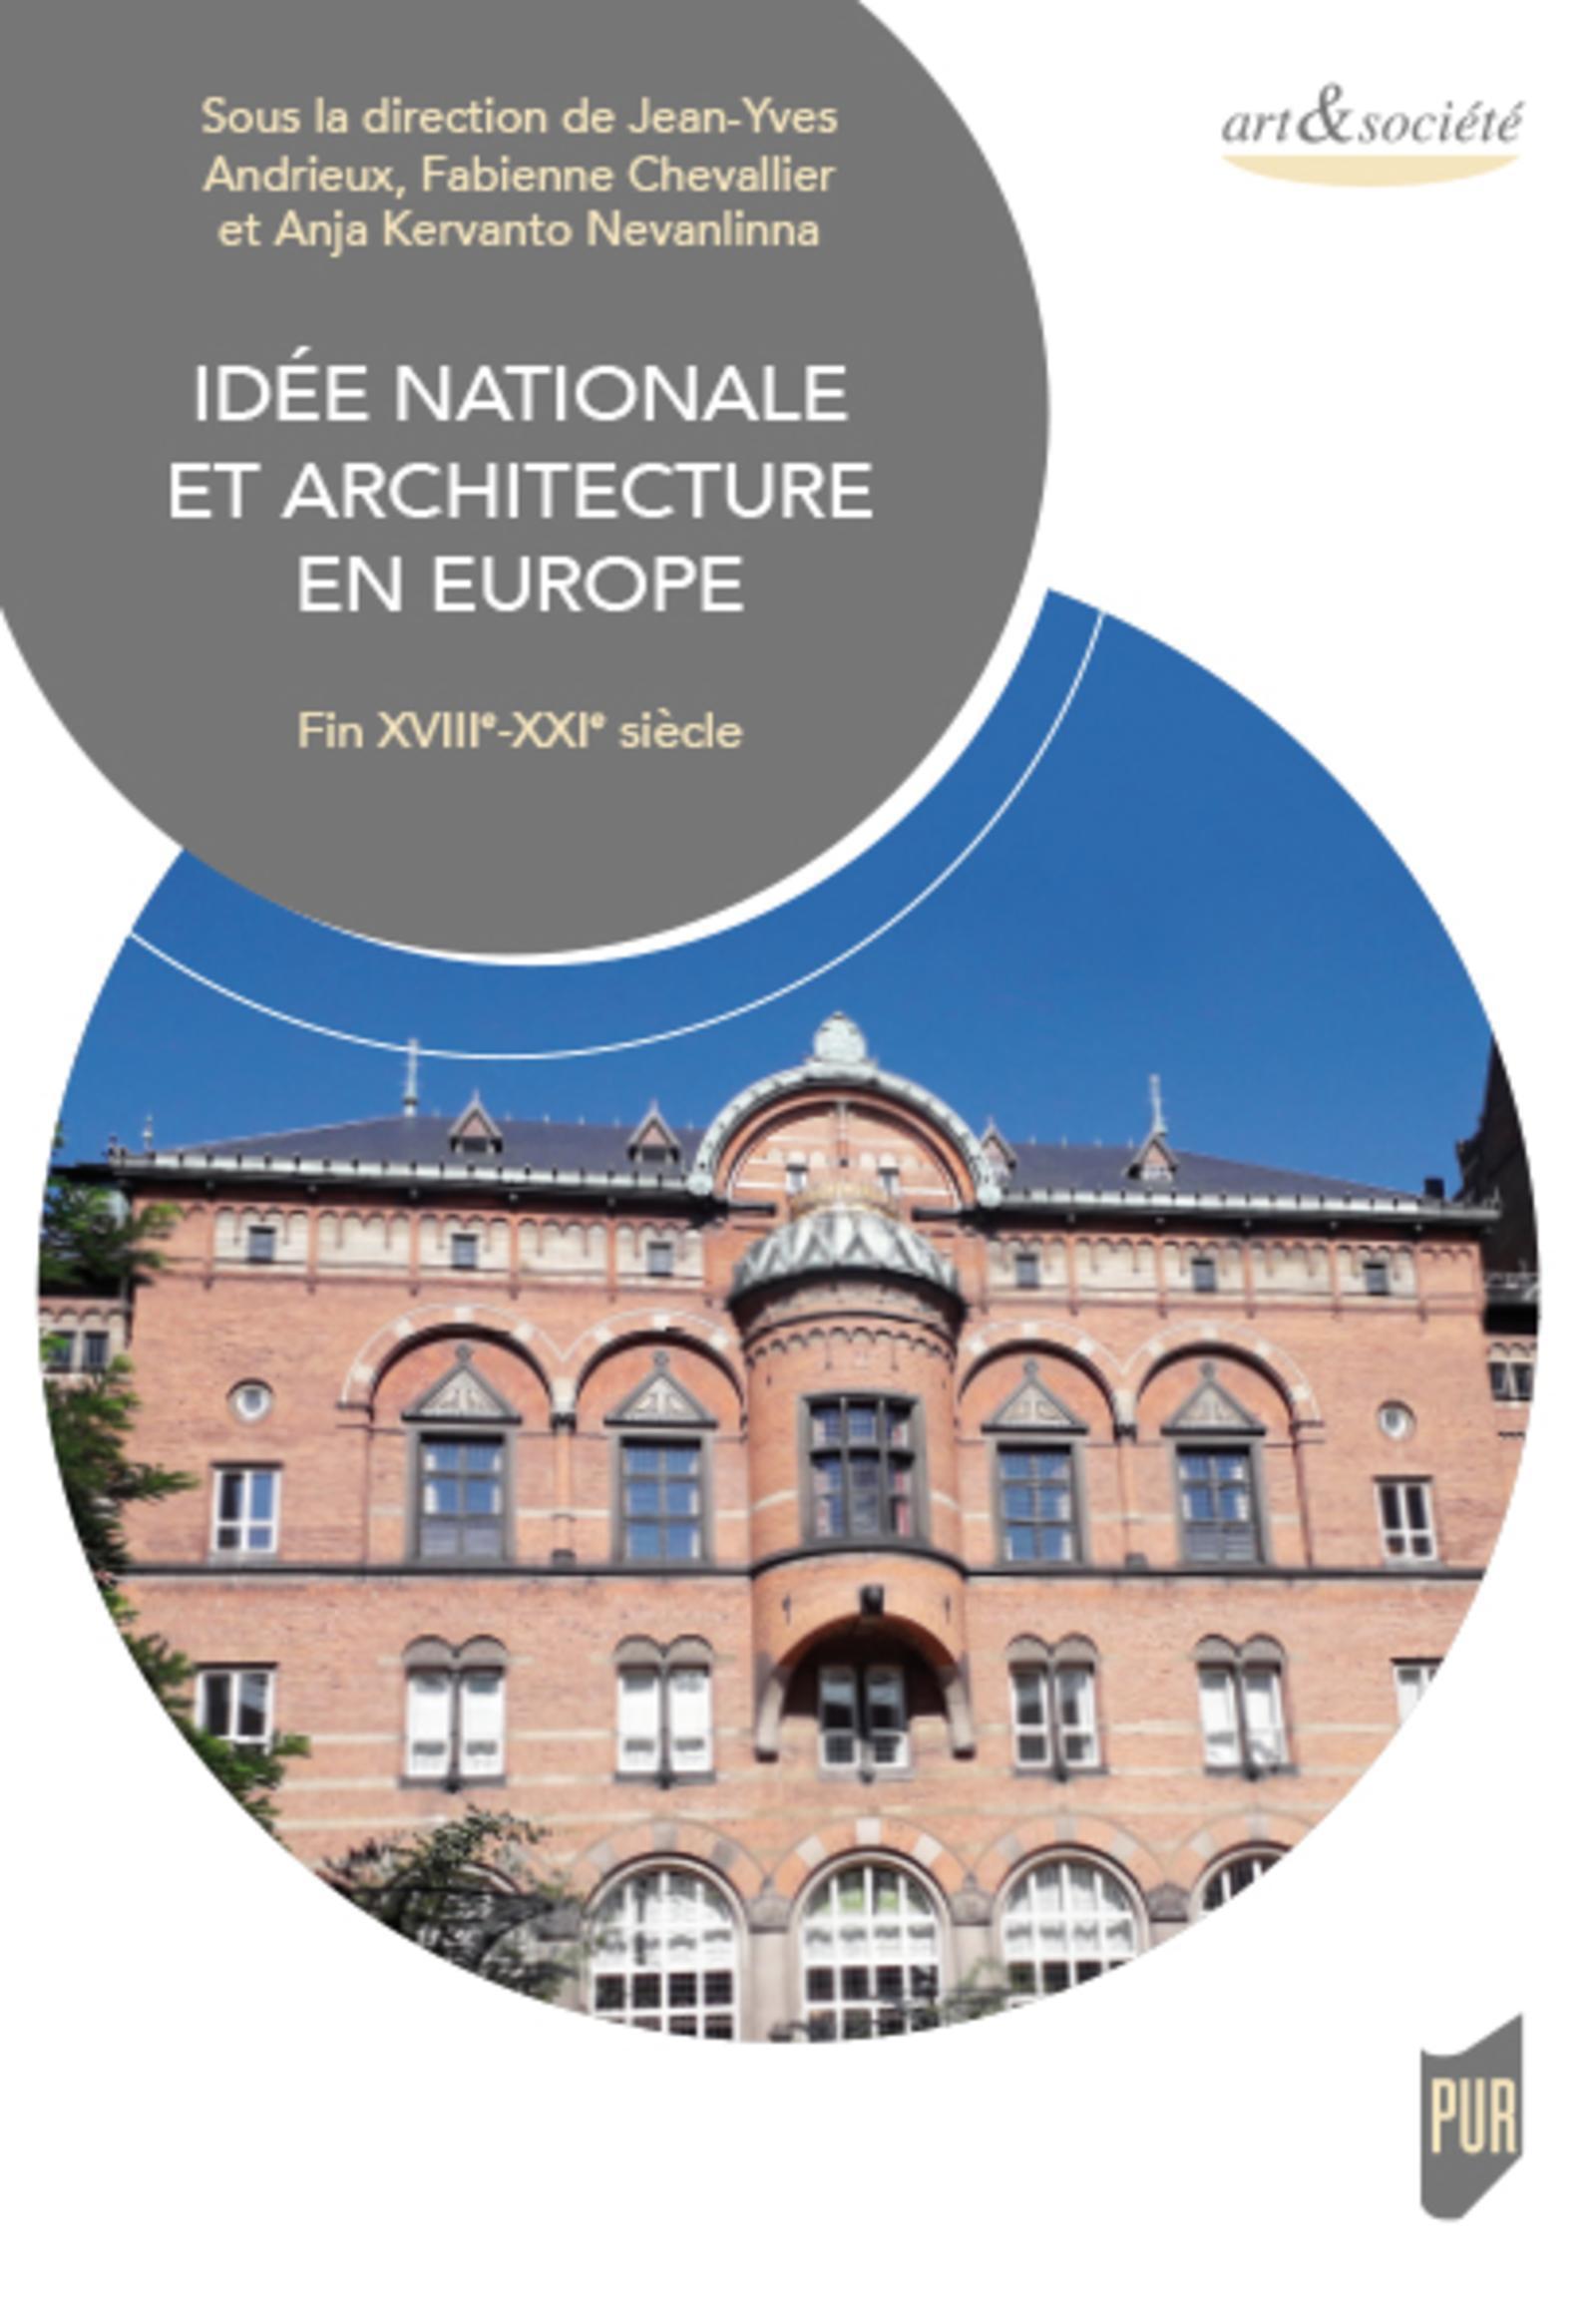 IDEE NATIONALE ET ARCHITECTURE EN EUROPE - FIN XVIIIE-XXIE SIECLE